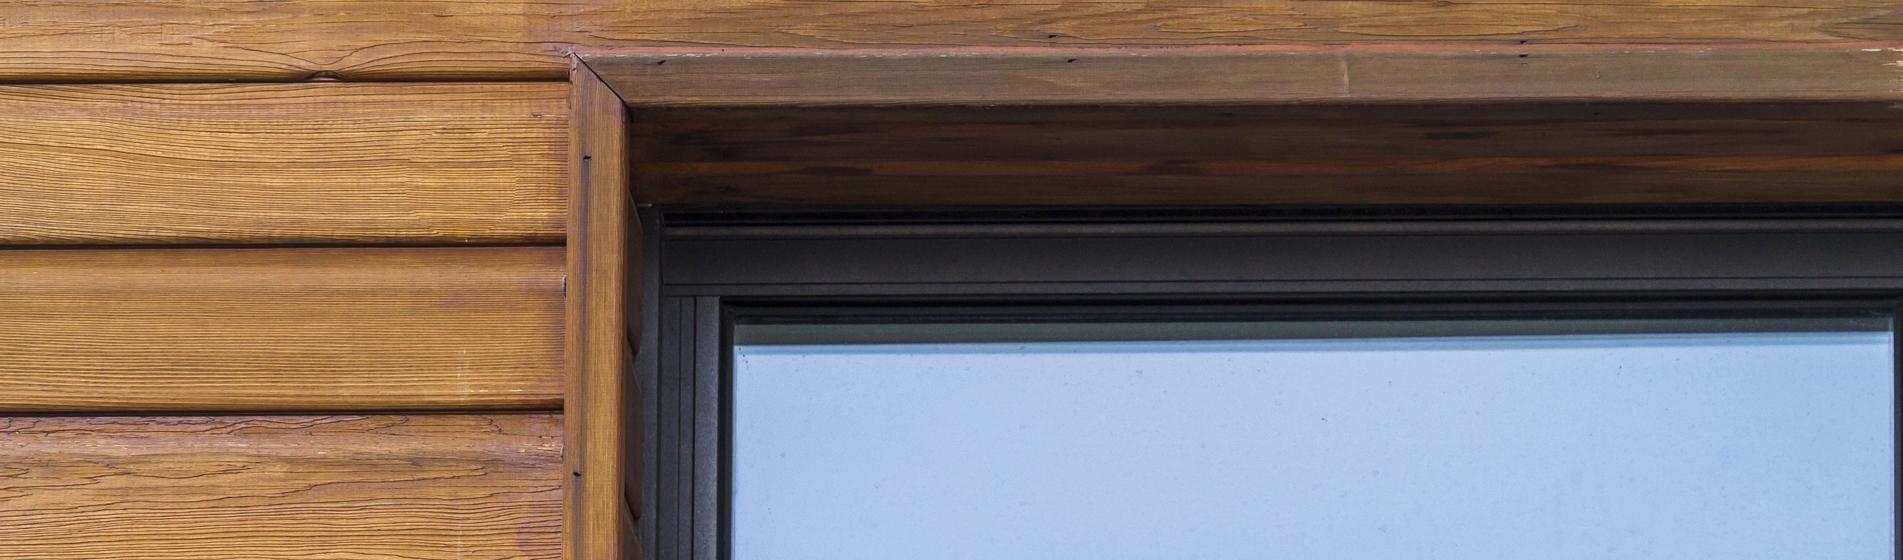 acheter fenêtre alu sur-mesure 30 Gard